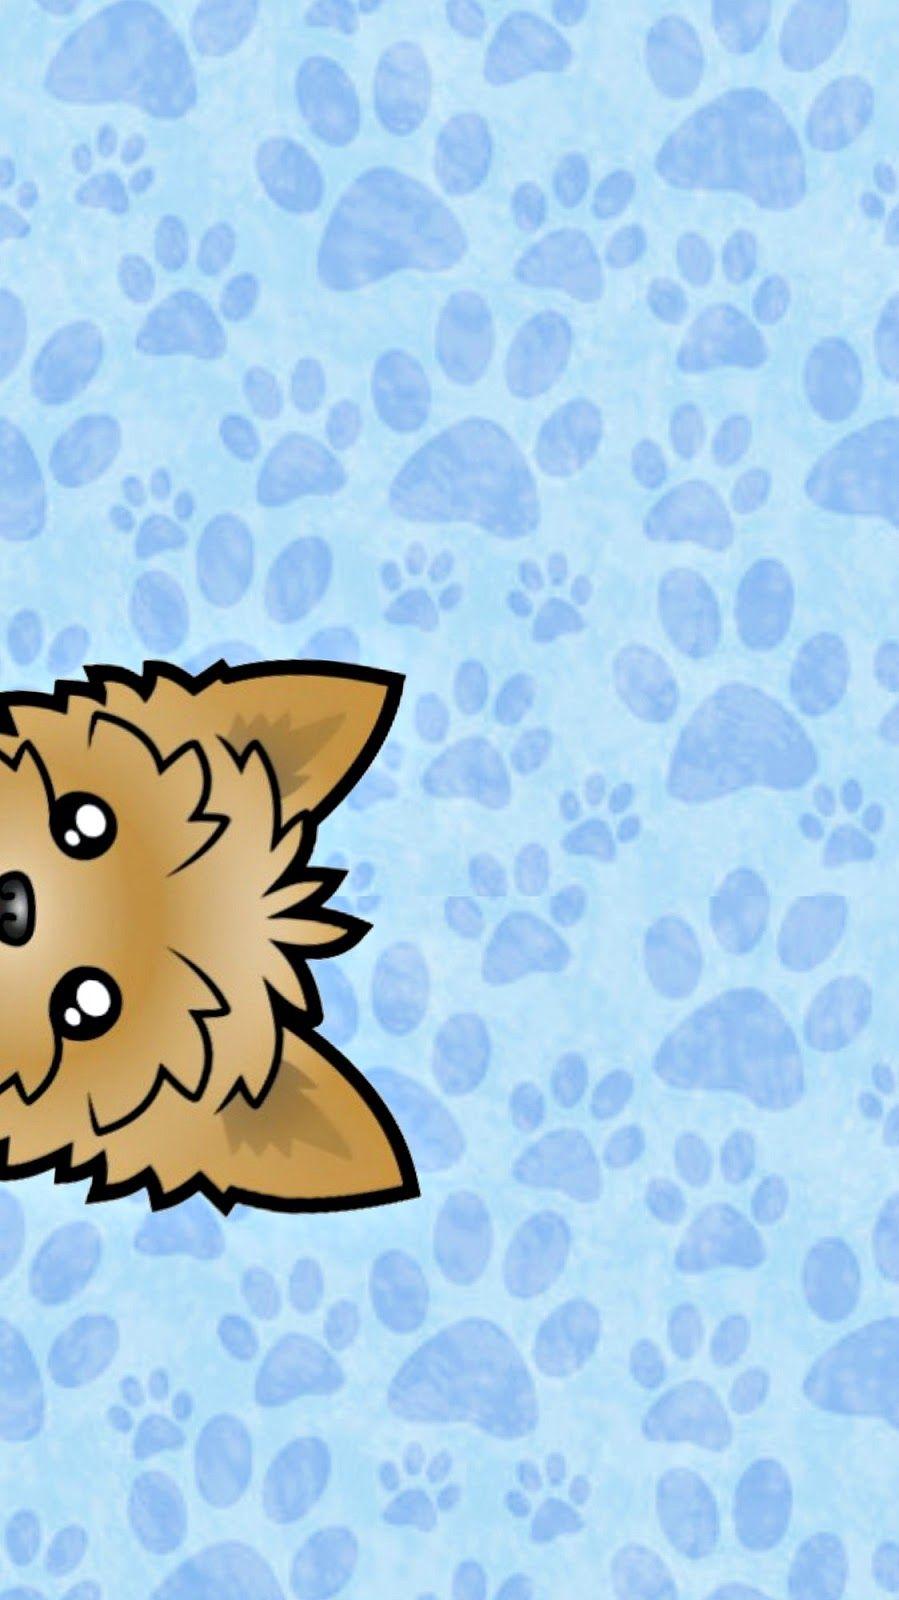 Ipdash dog wallpapers yorkie pinterest wallpaper dog